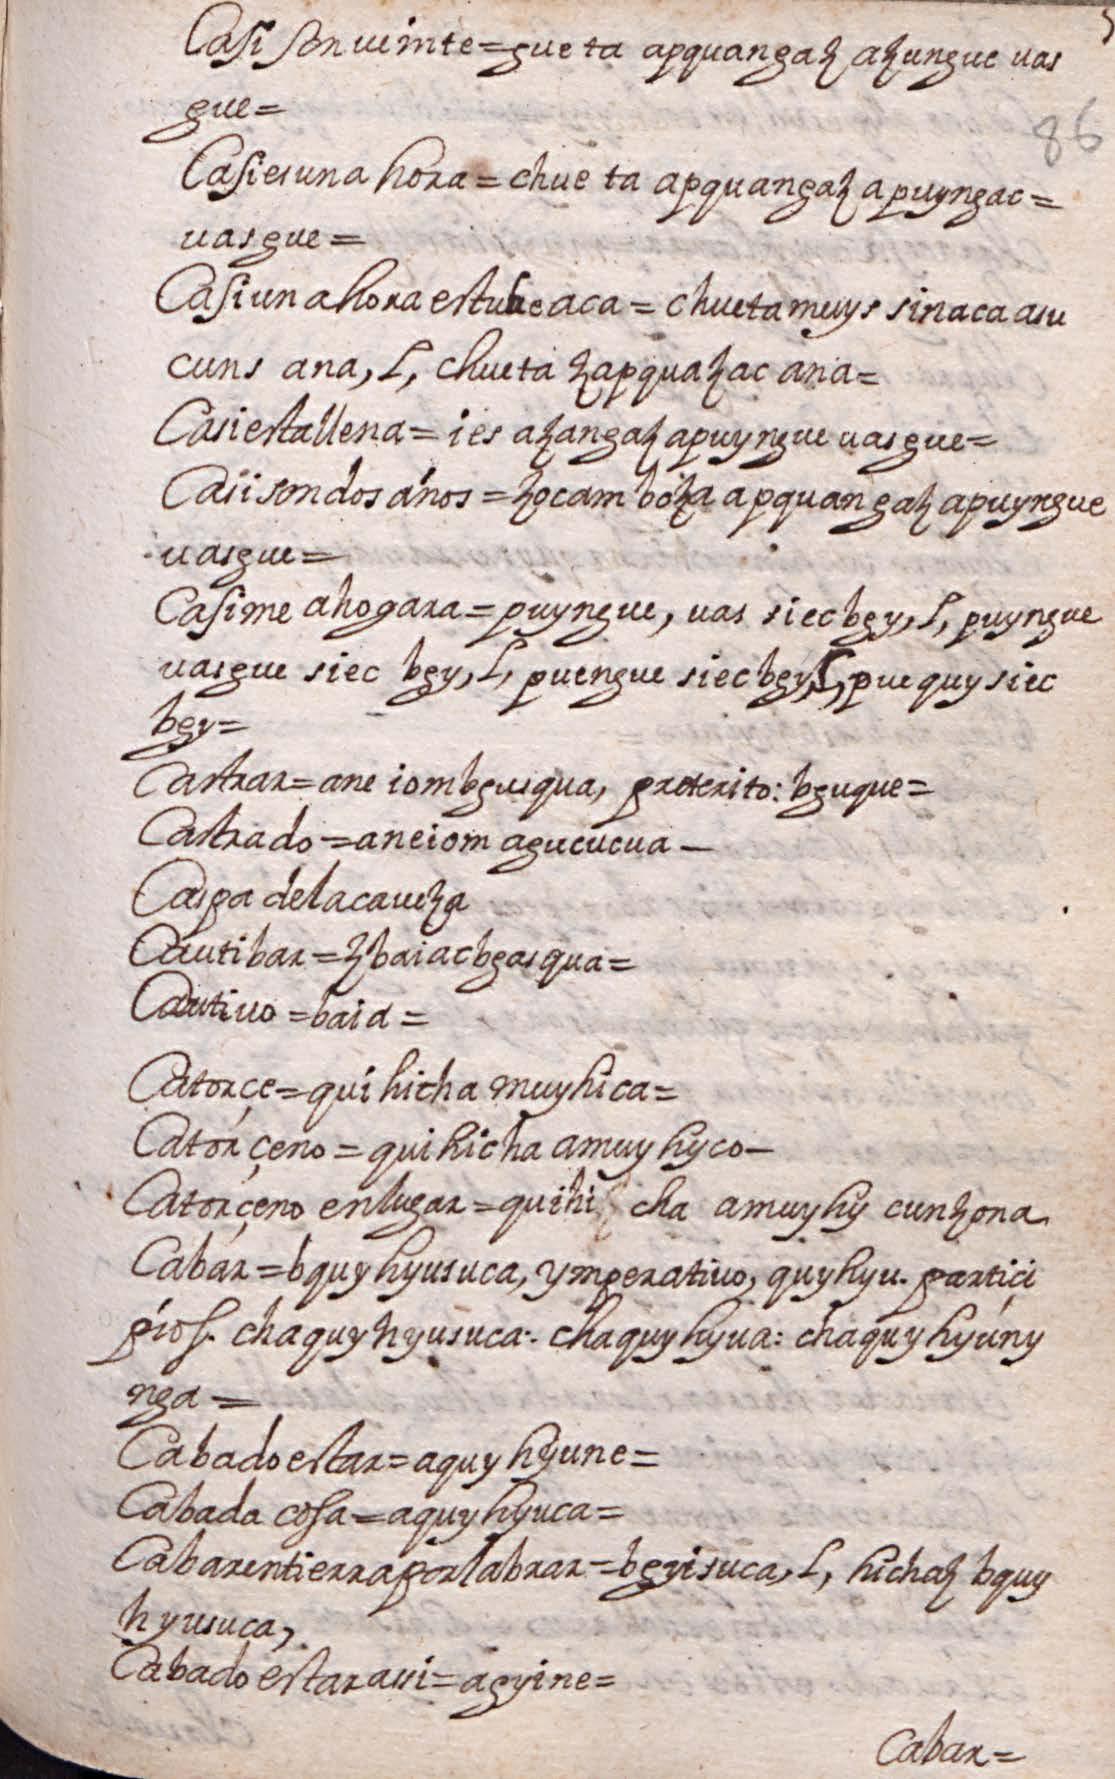 Manuscrito 158 BNC Vocabulario - fol 38r.jpg